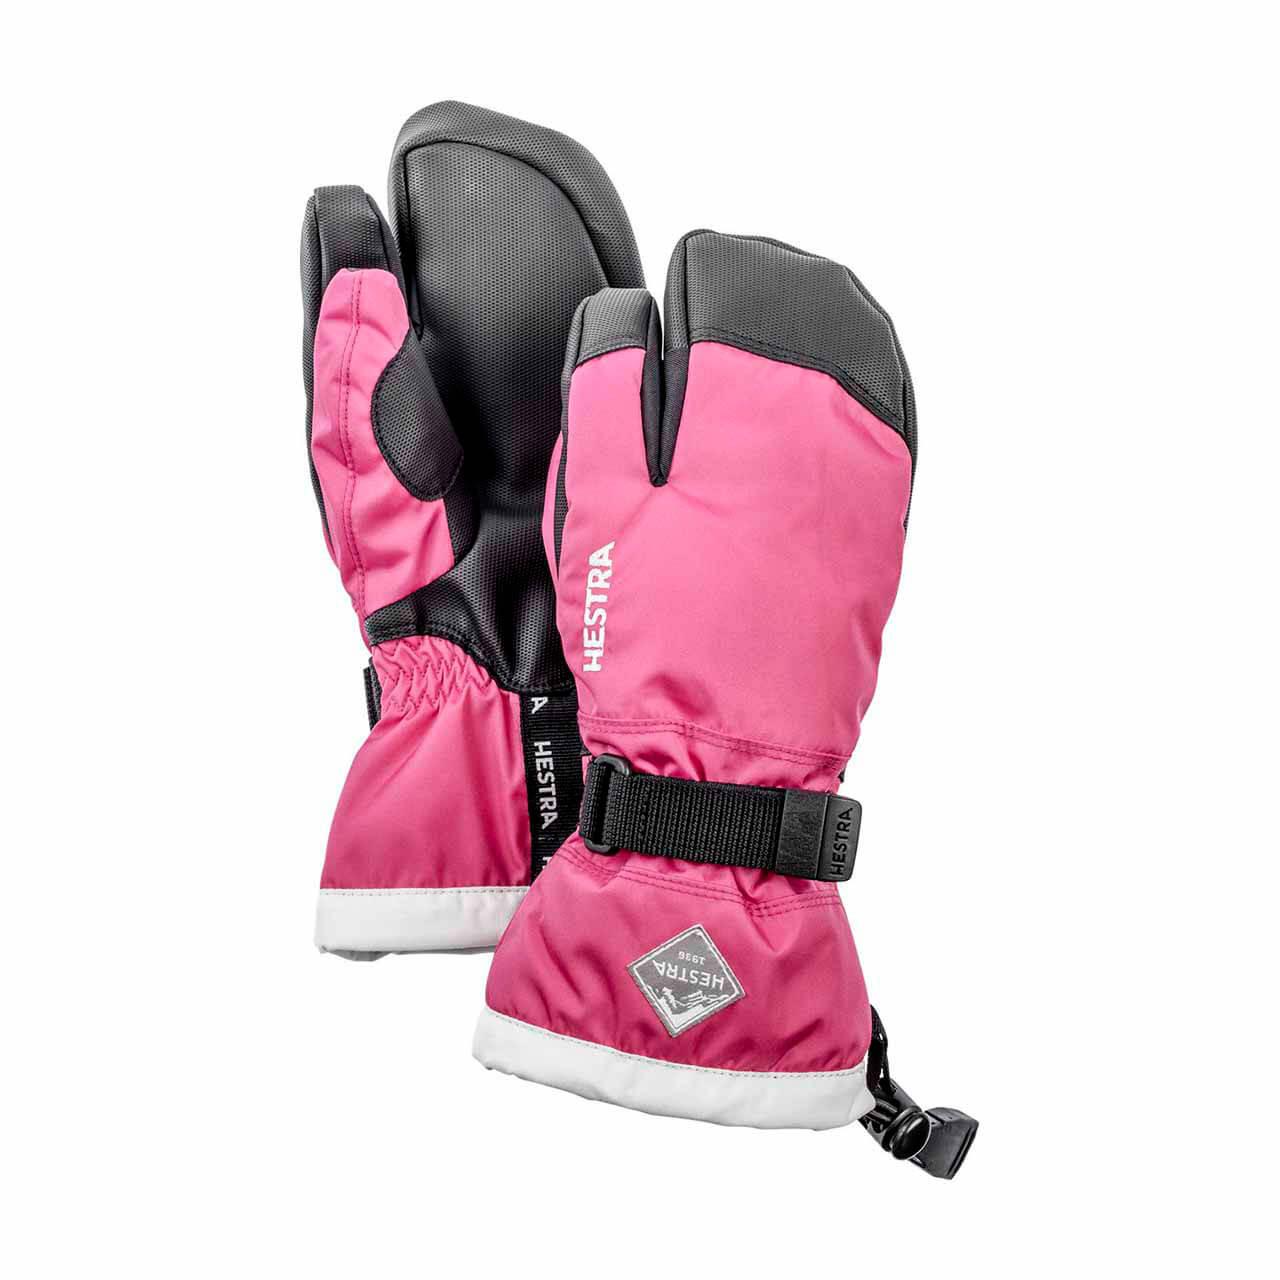 paras arvo superlaatu uusia valokuvia Hestra Gauntlet CZone Jr. 3 Finger Glove